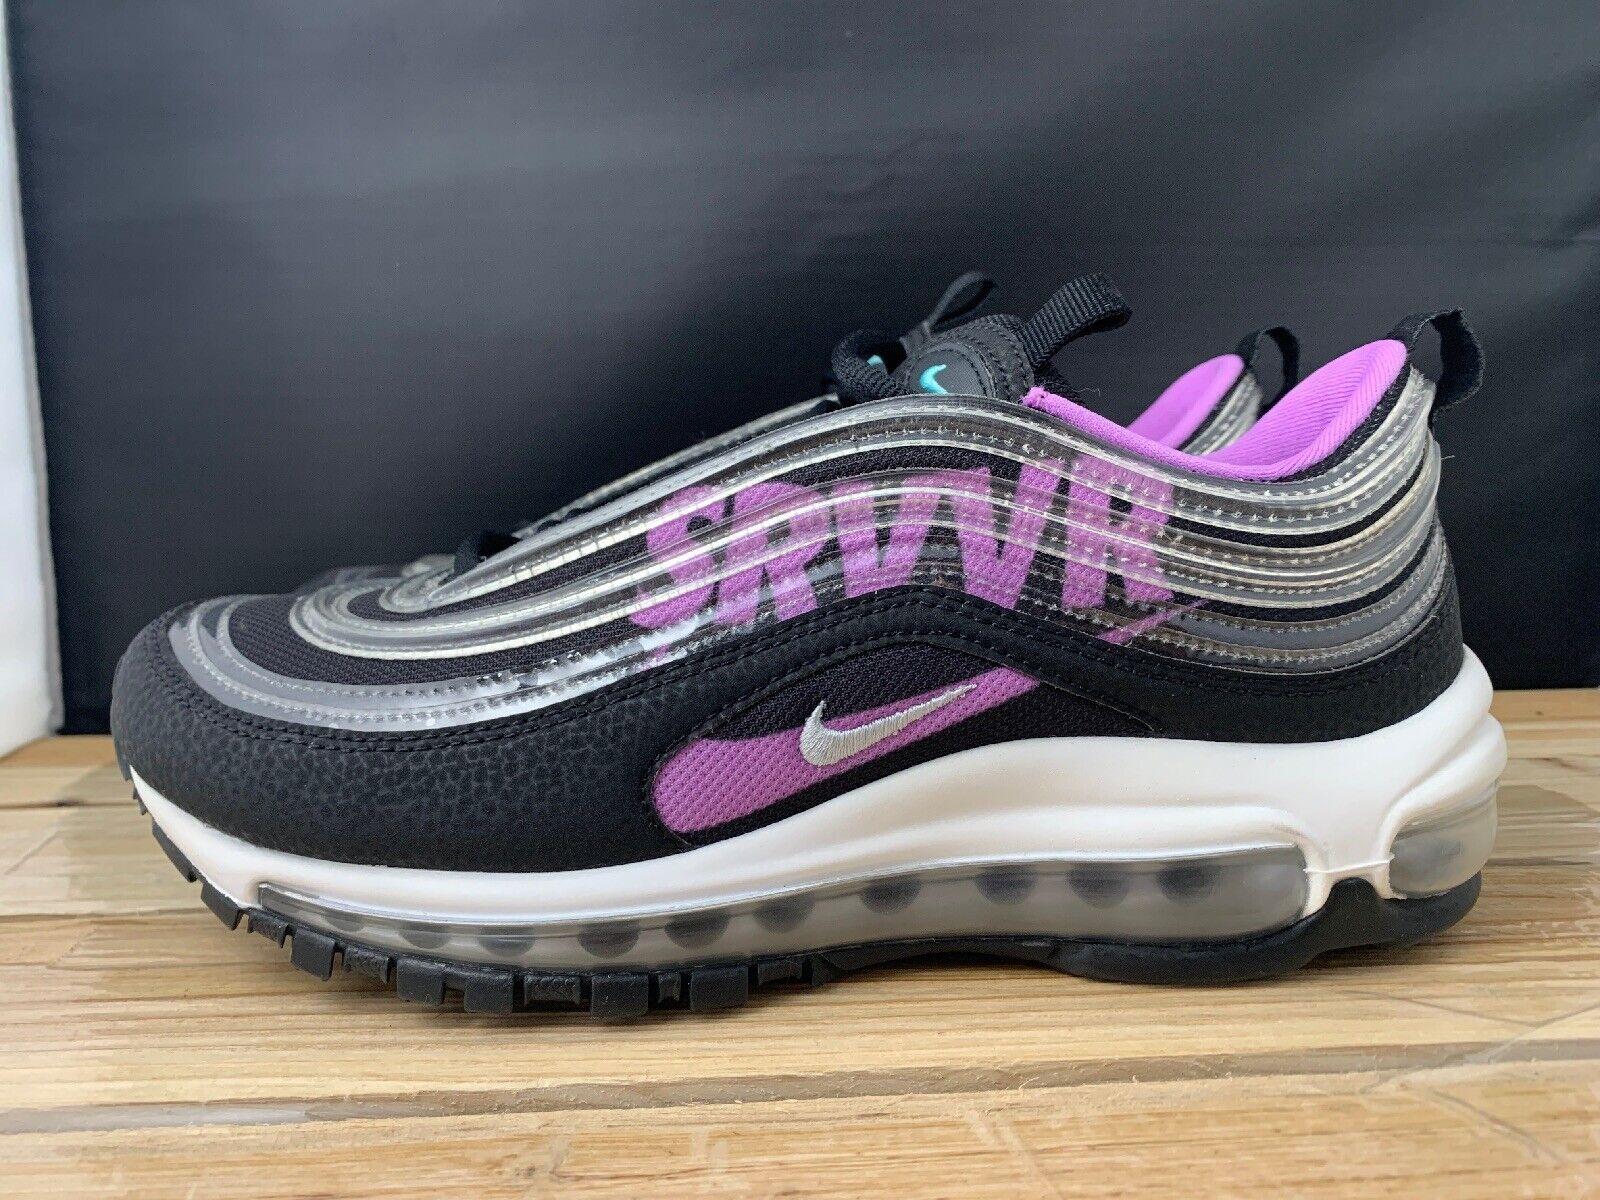 nike air max 97 black white purple